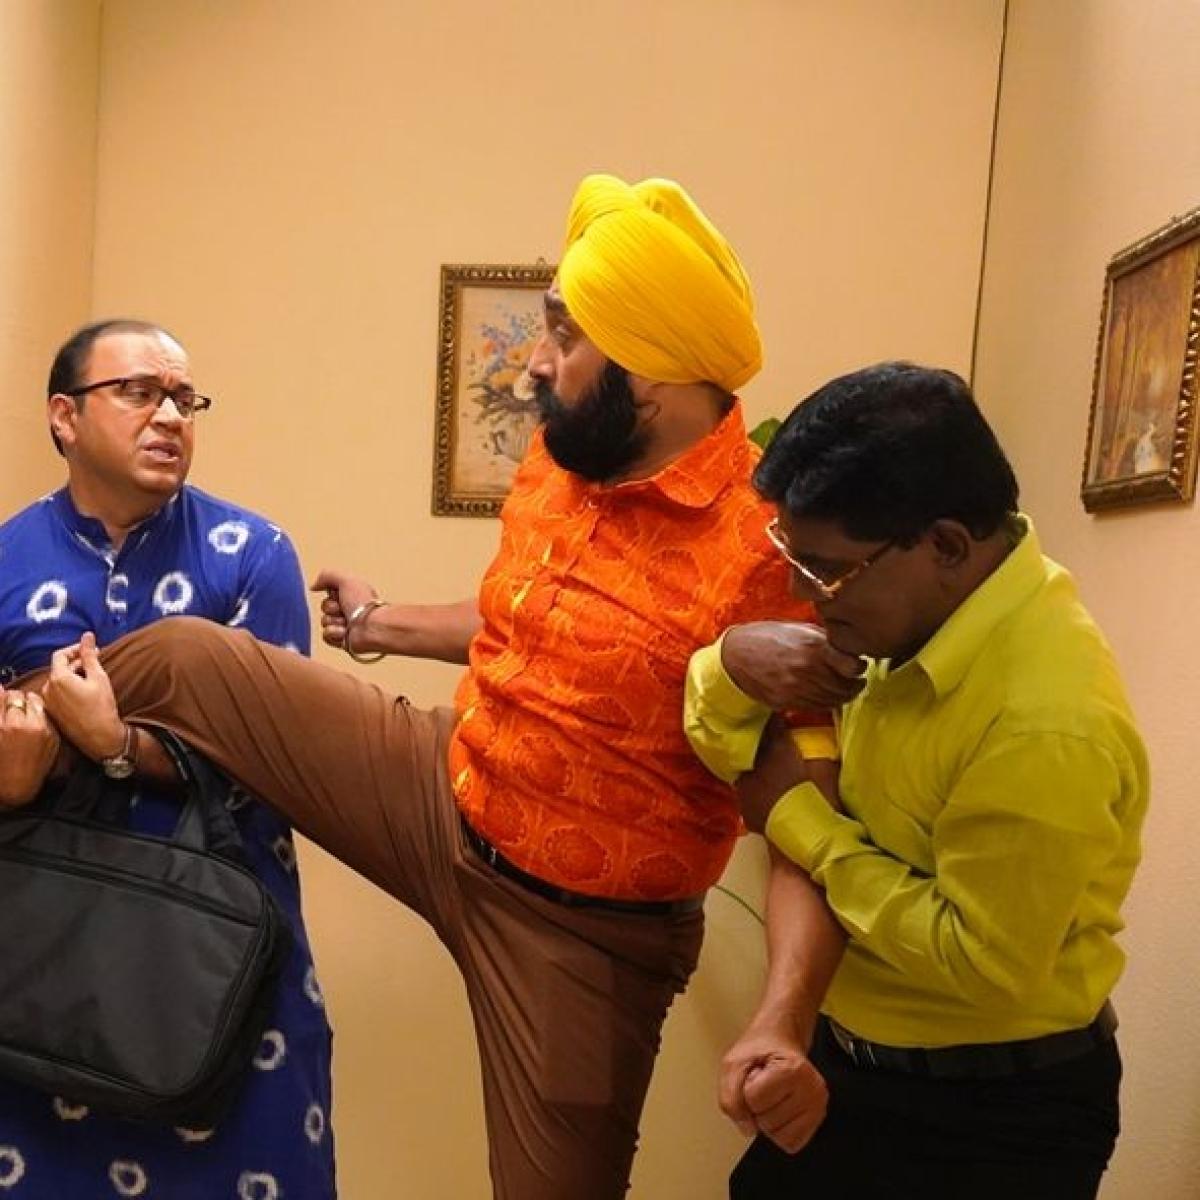 Taarak Mehta Ka Ooltah Chashmah: Popatlal disappears from Gokuldhaam Society